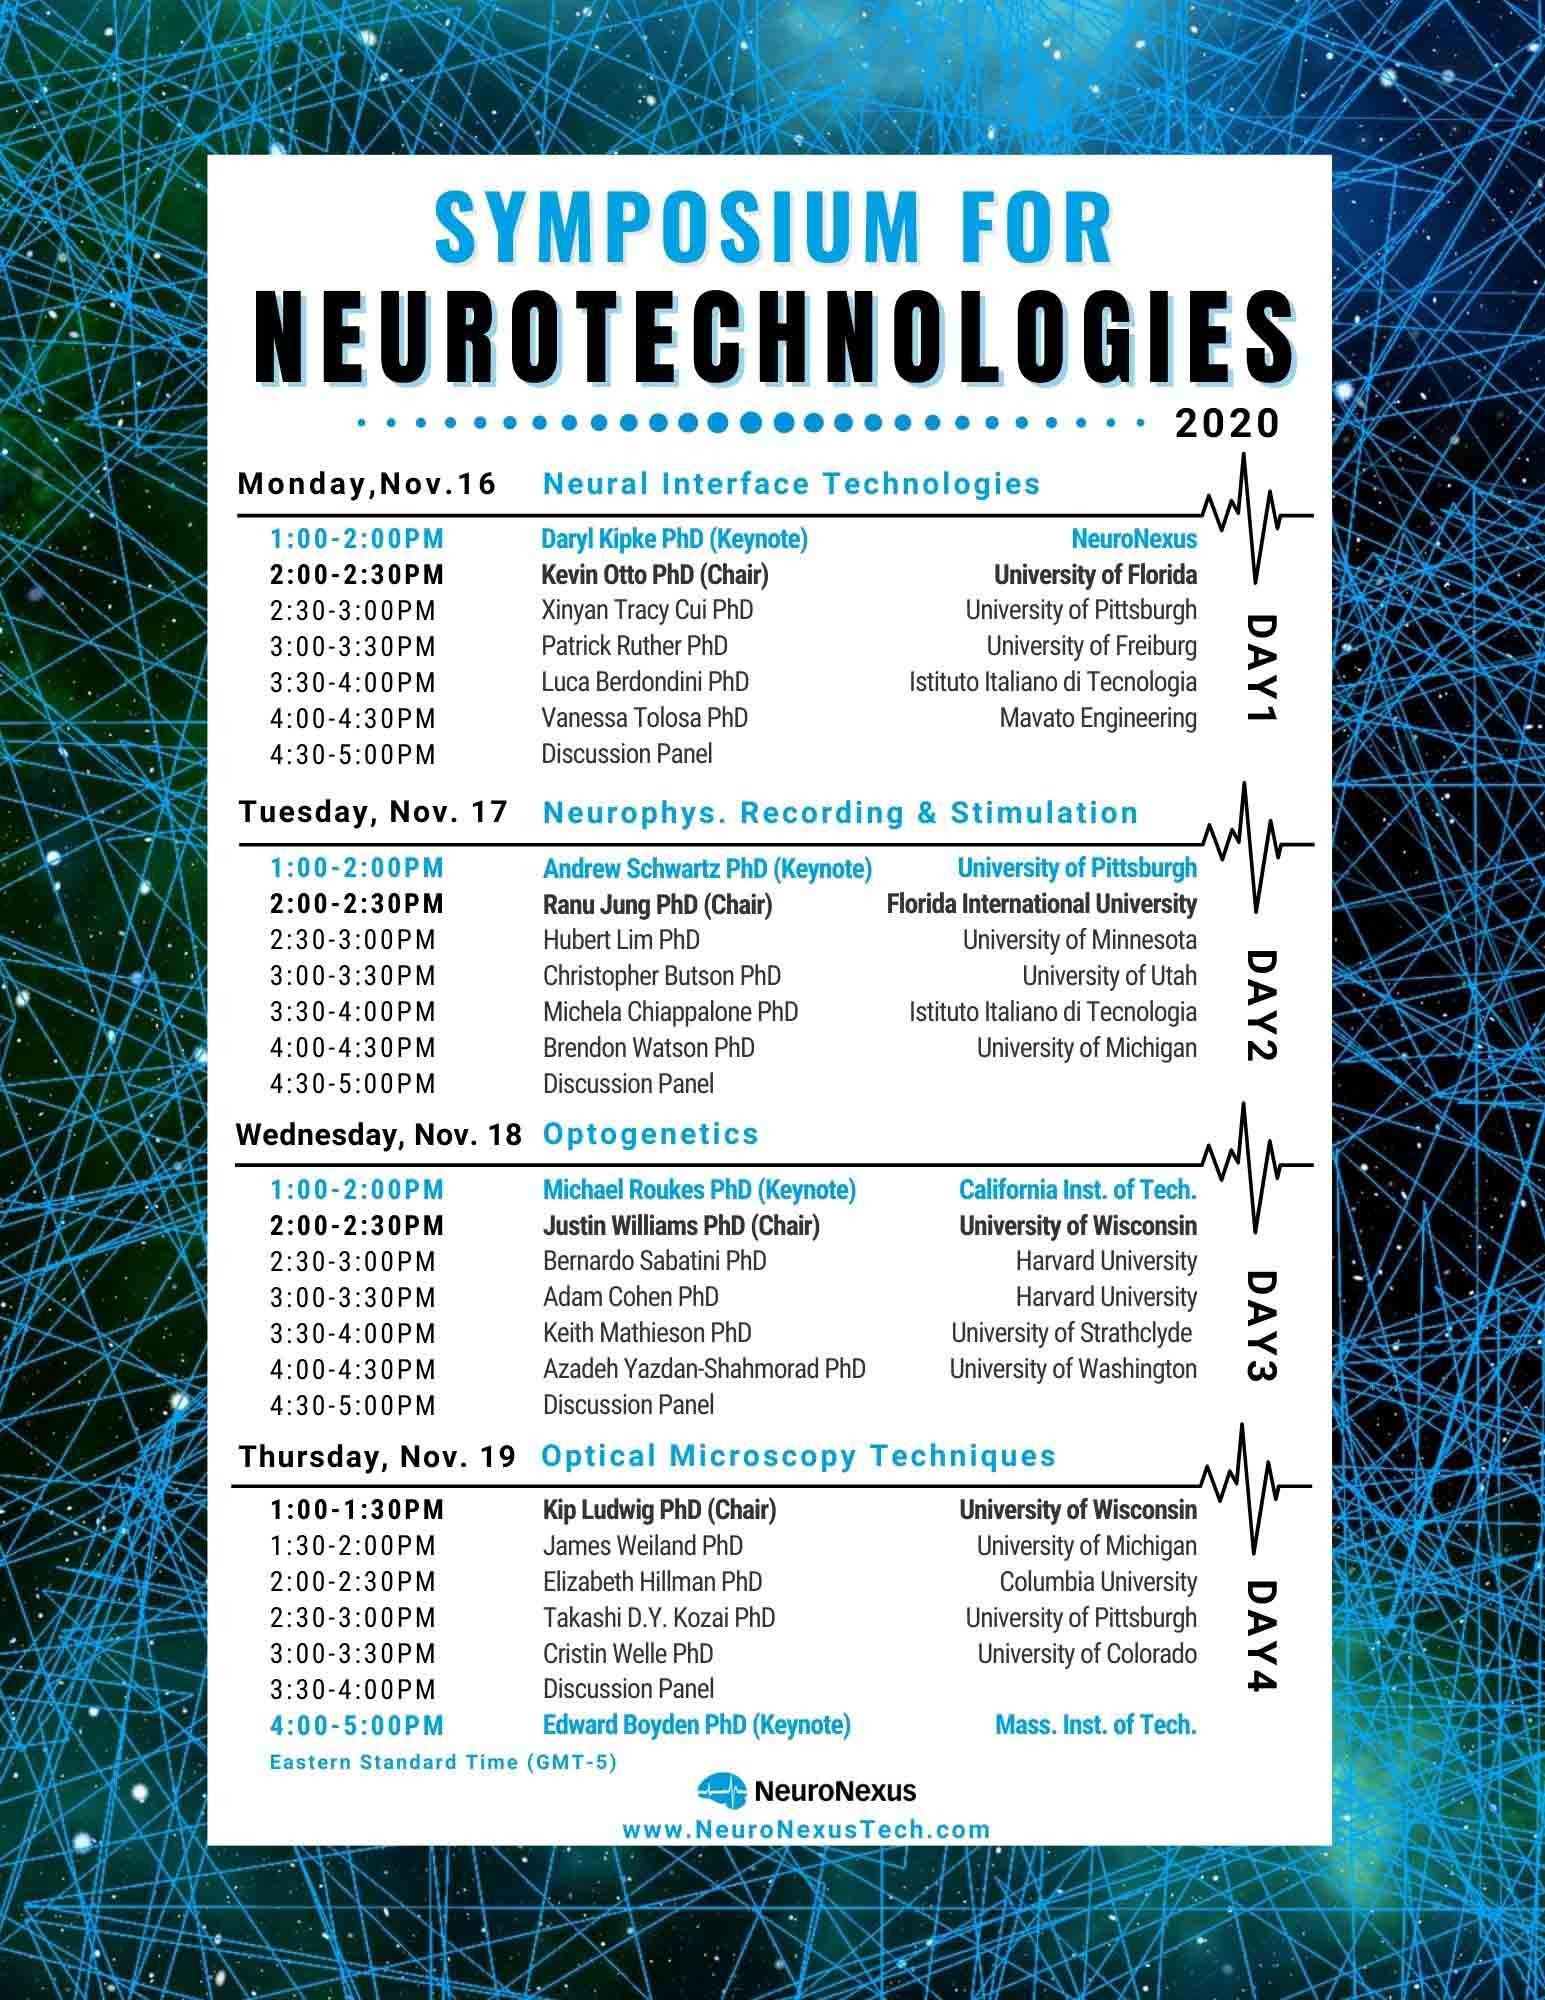 NeuroNexus公司举办神经科学线上研讨会